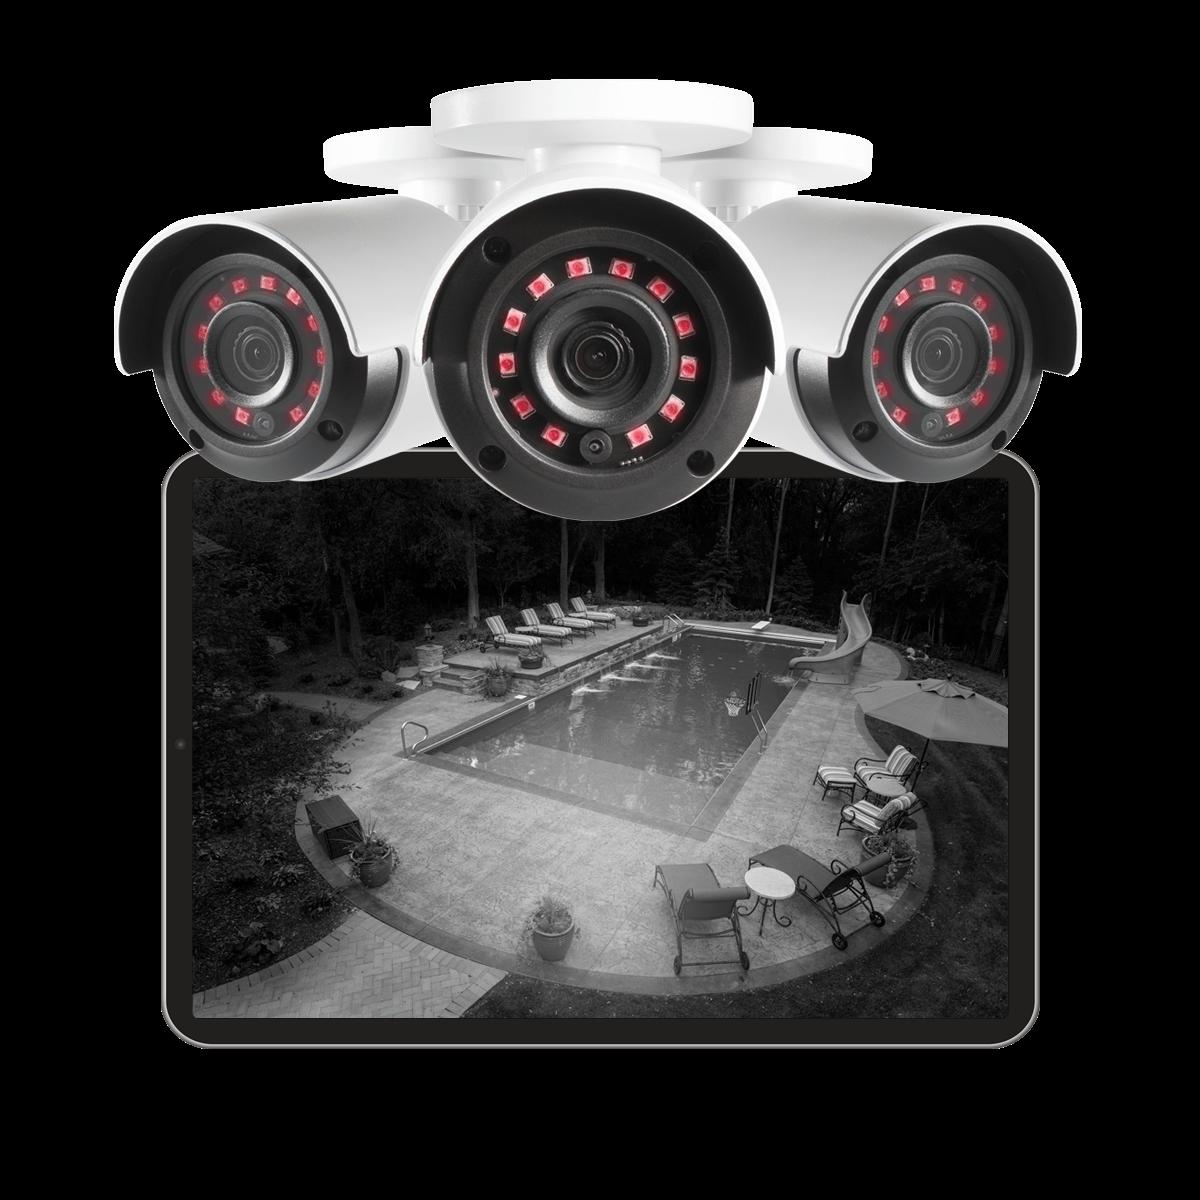 night vision HD security camera